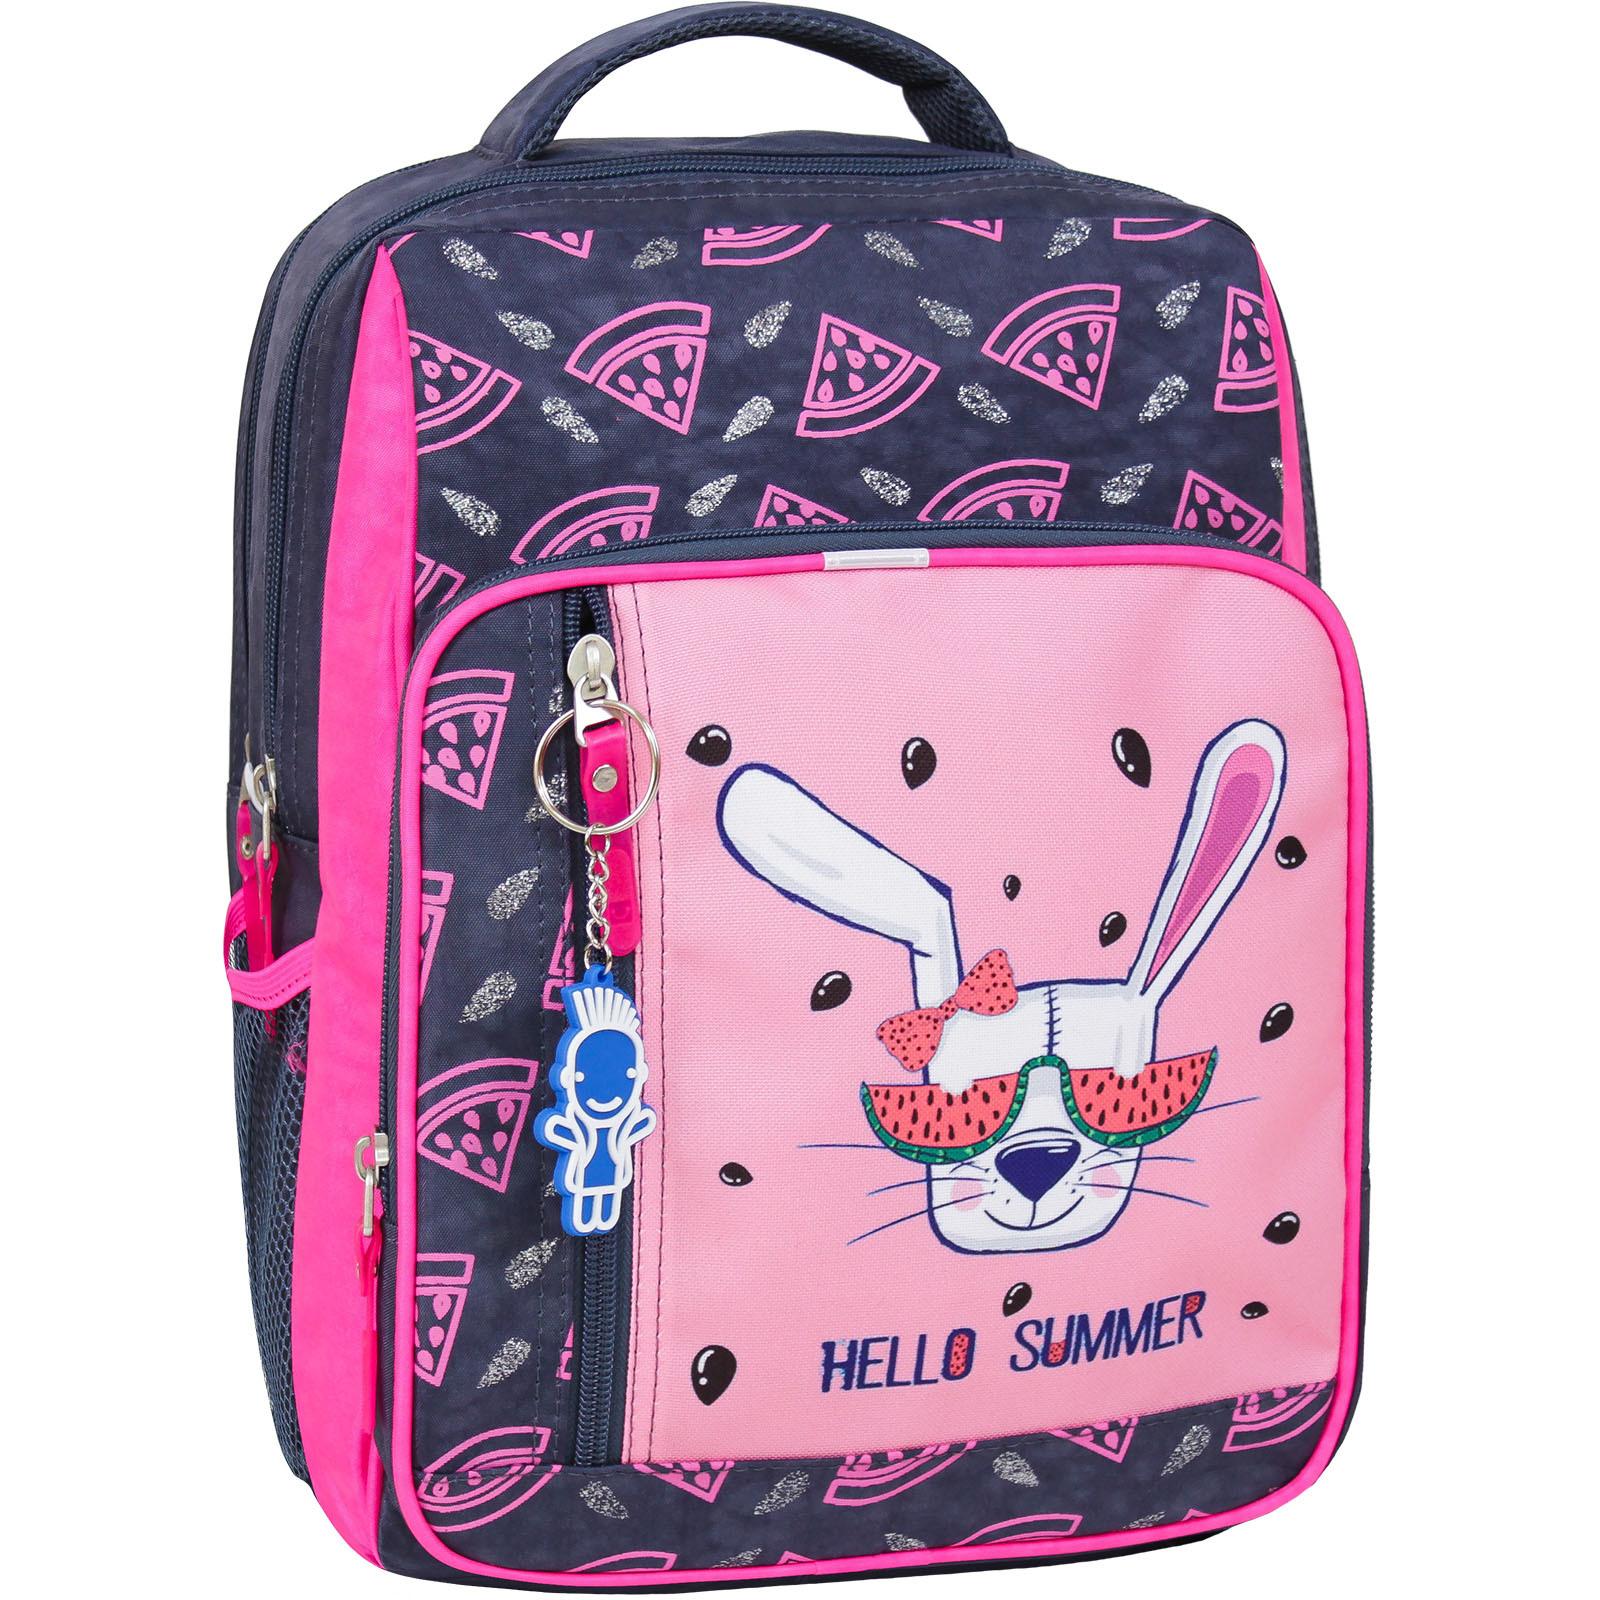 Школьные рюкзаки Рюкзак школьный Bagland Школьник 8 л. 321 серый 204к (00112702) IMG_4853-суб204к.jpg